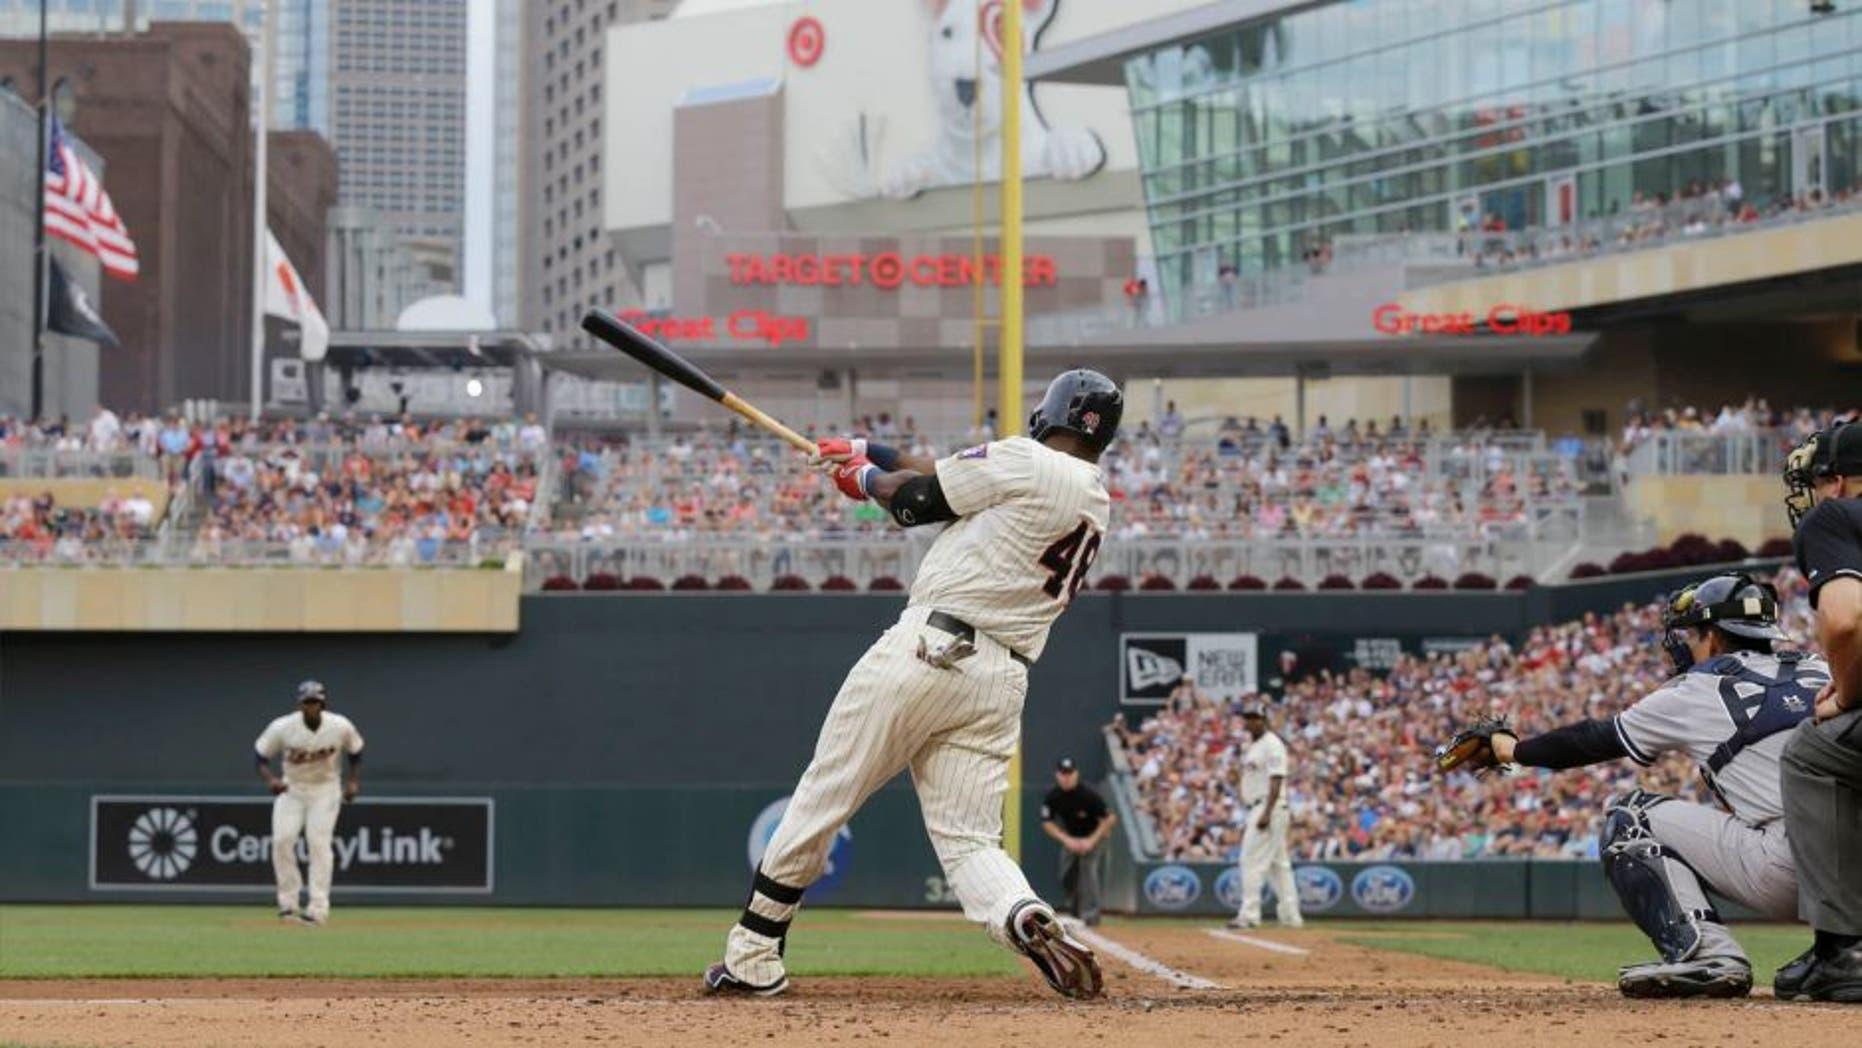 The Minnesota Twins' Torii Hunter hits a three-run home run off New York Yankees starting pitcher CC Sabathia during the third inning in Minneapolis, Saturday, July 25, 2015.